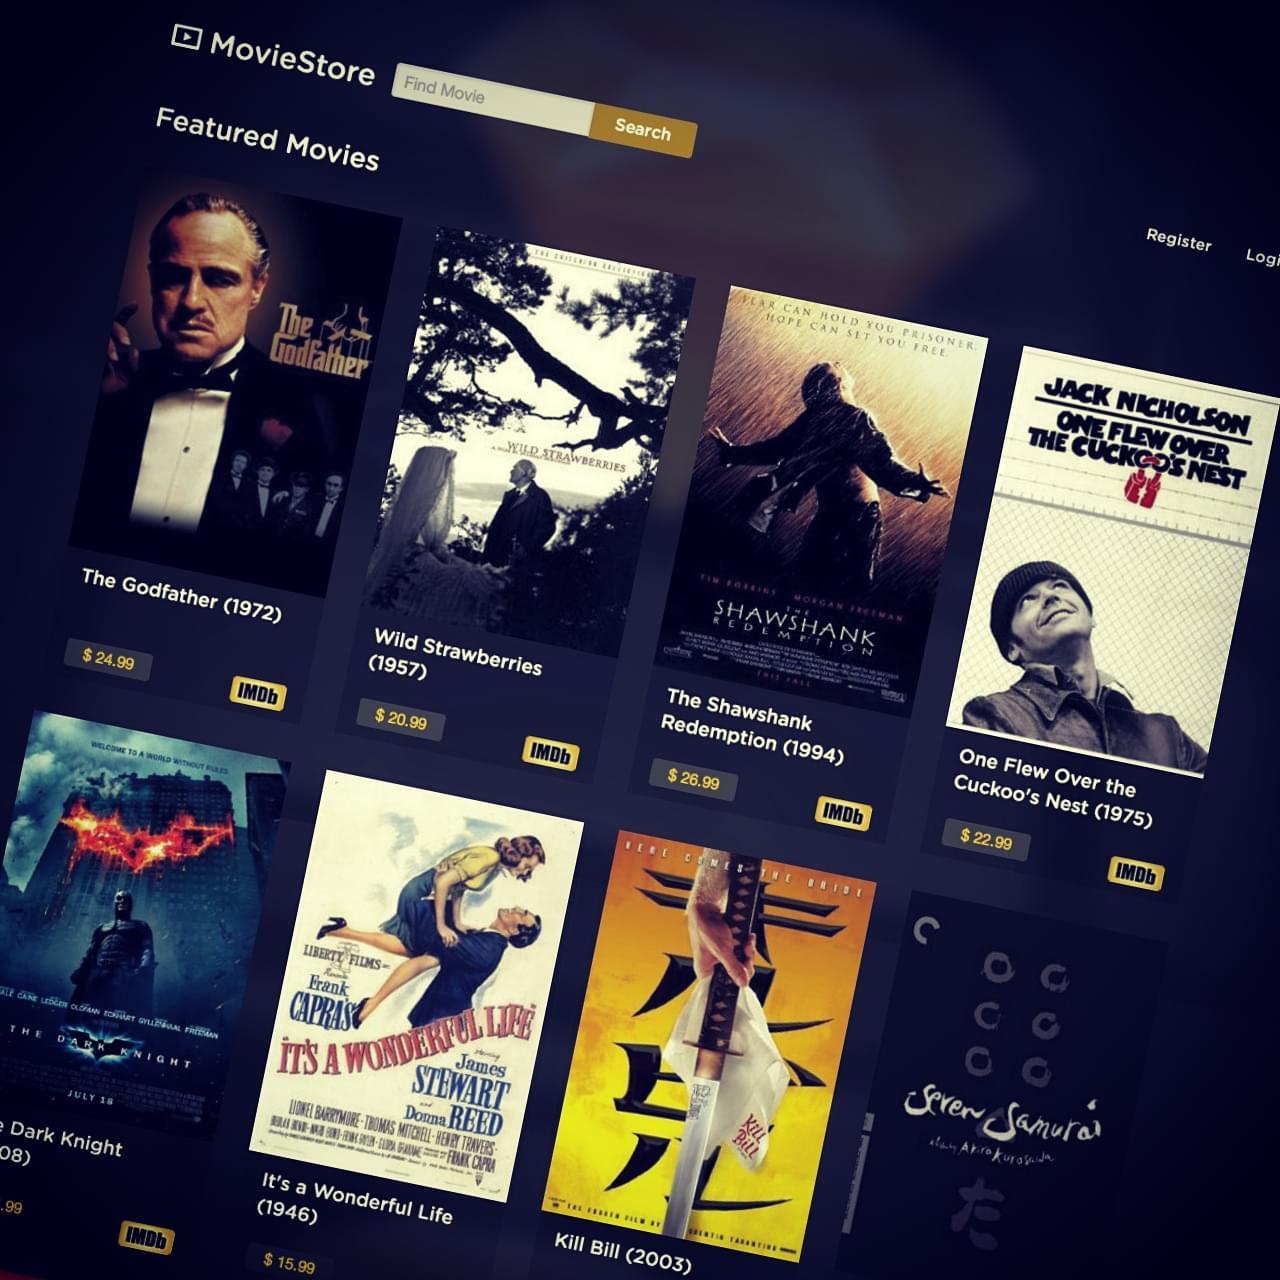 Final movie store screenshot